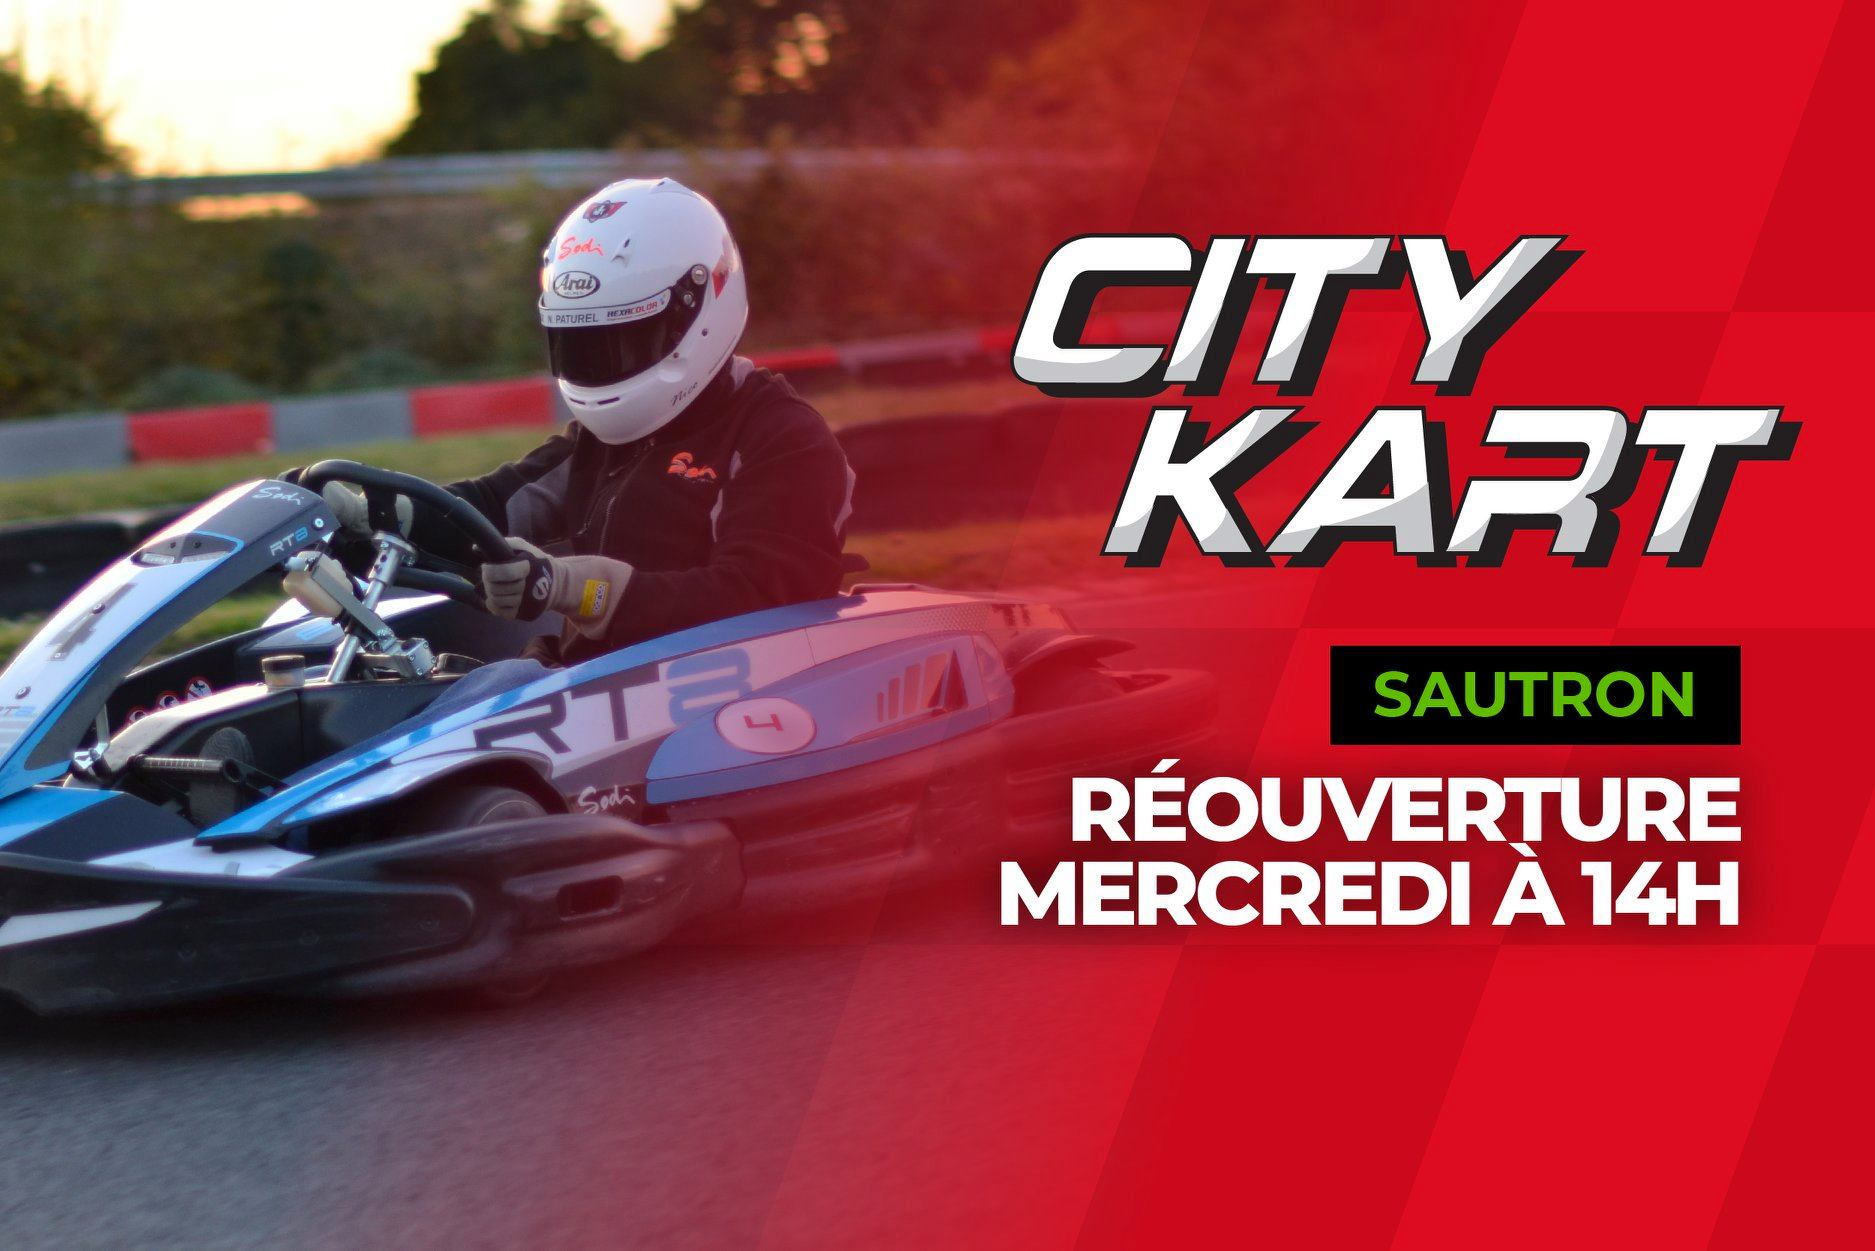 Reouverture City Kart Sautron.jpg